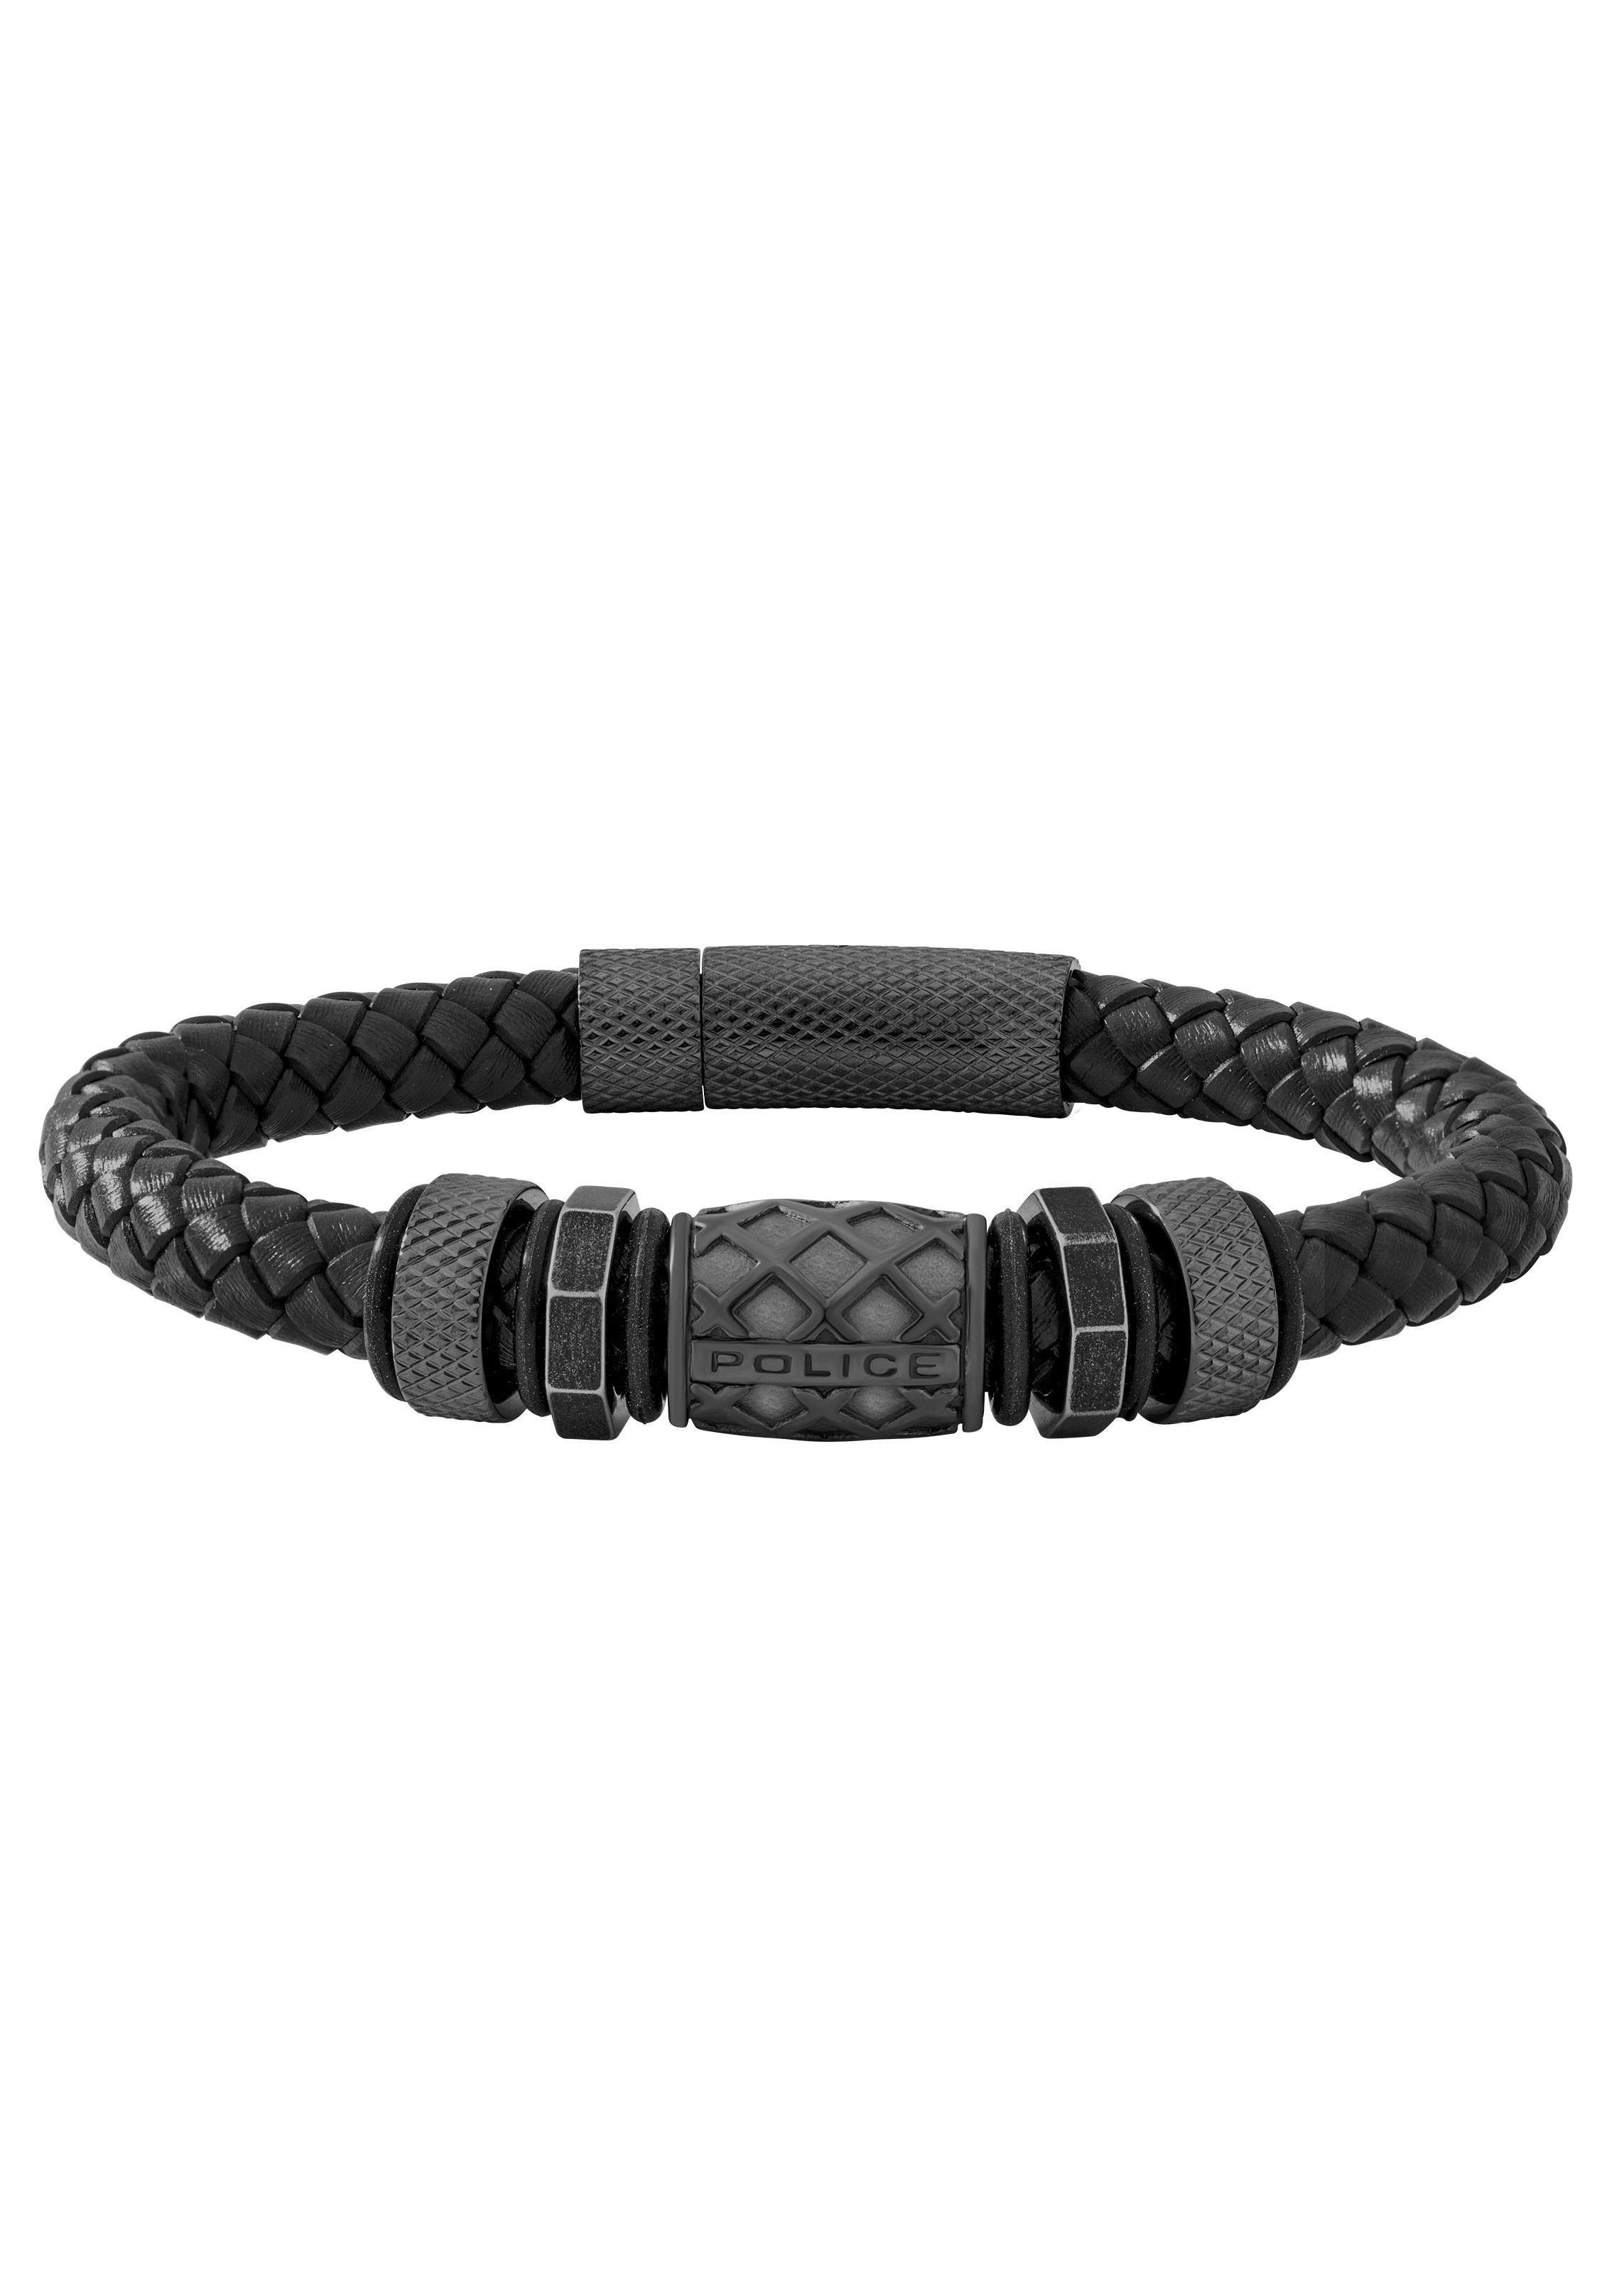 Police armband LONGFORD, PJ26458BLB.01 online kopen op otto.nl